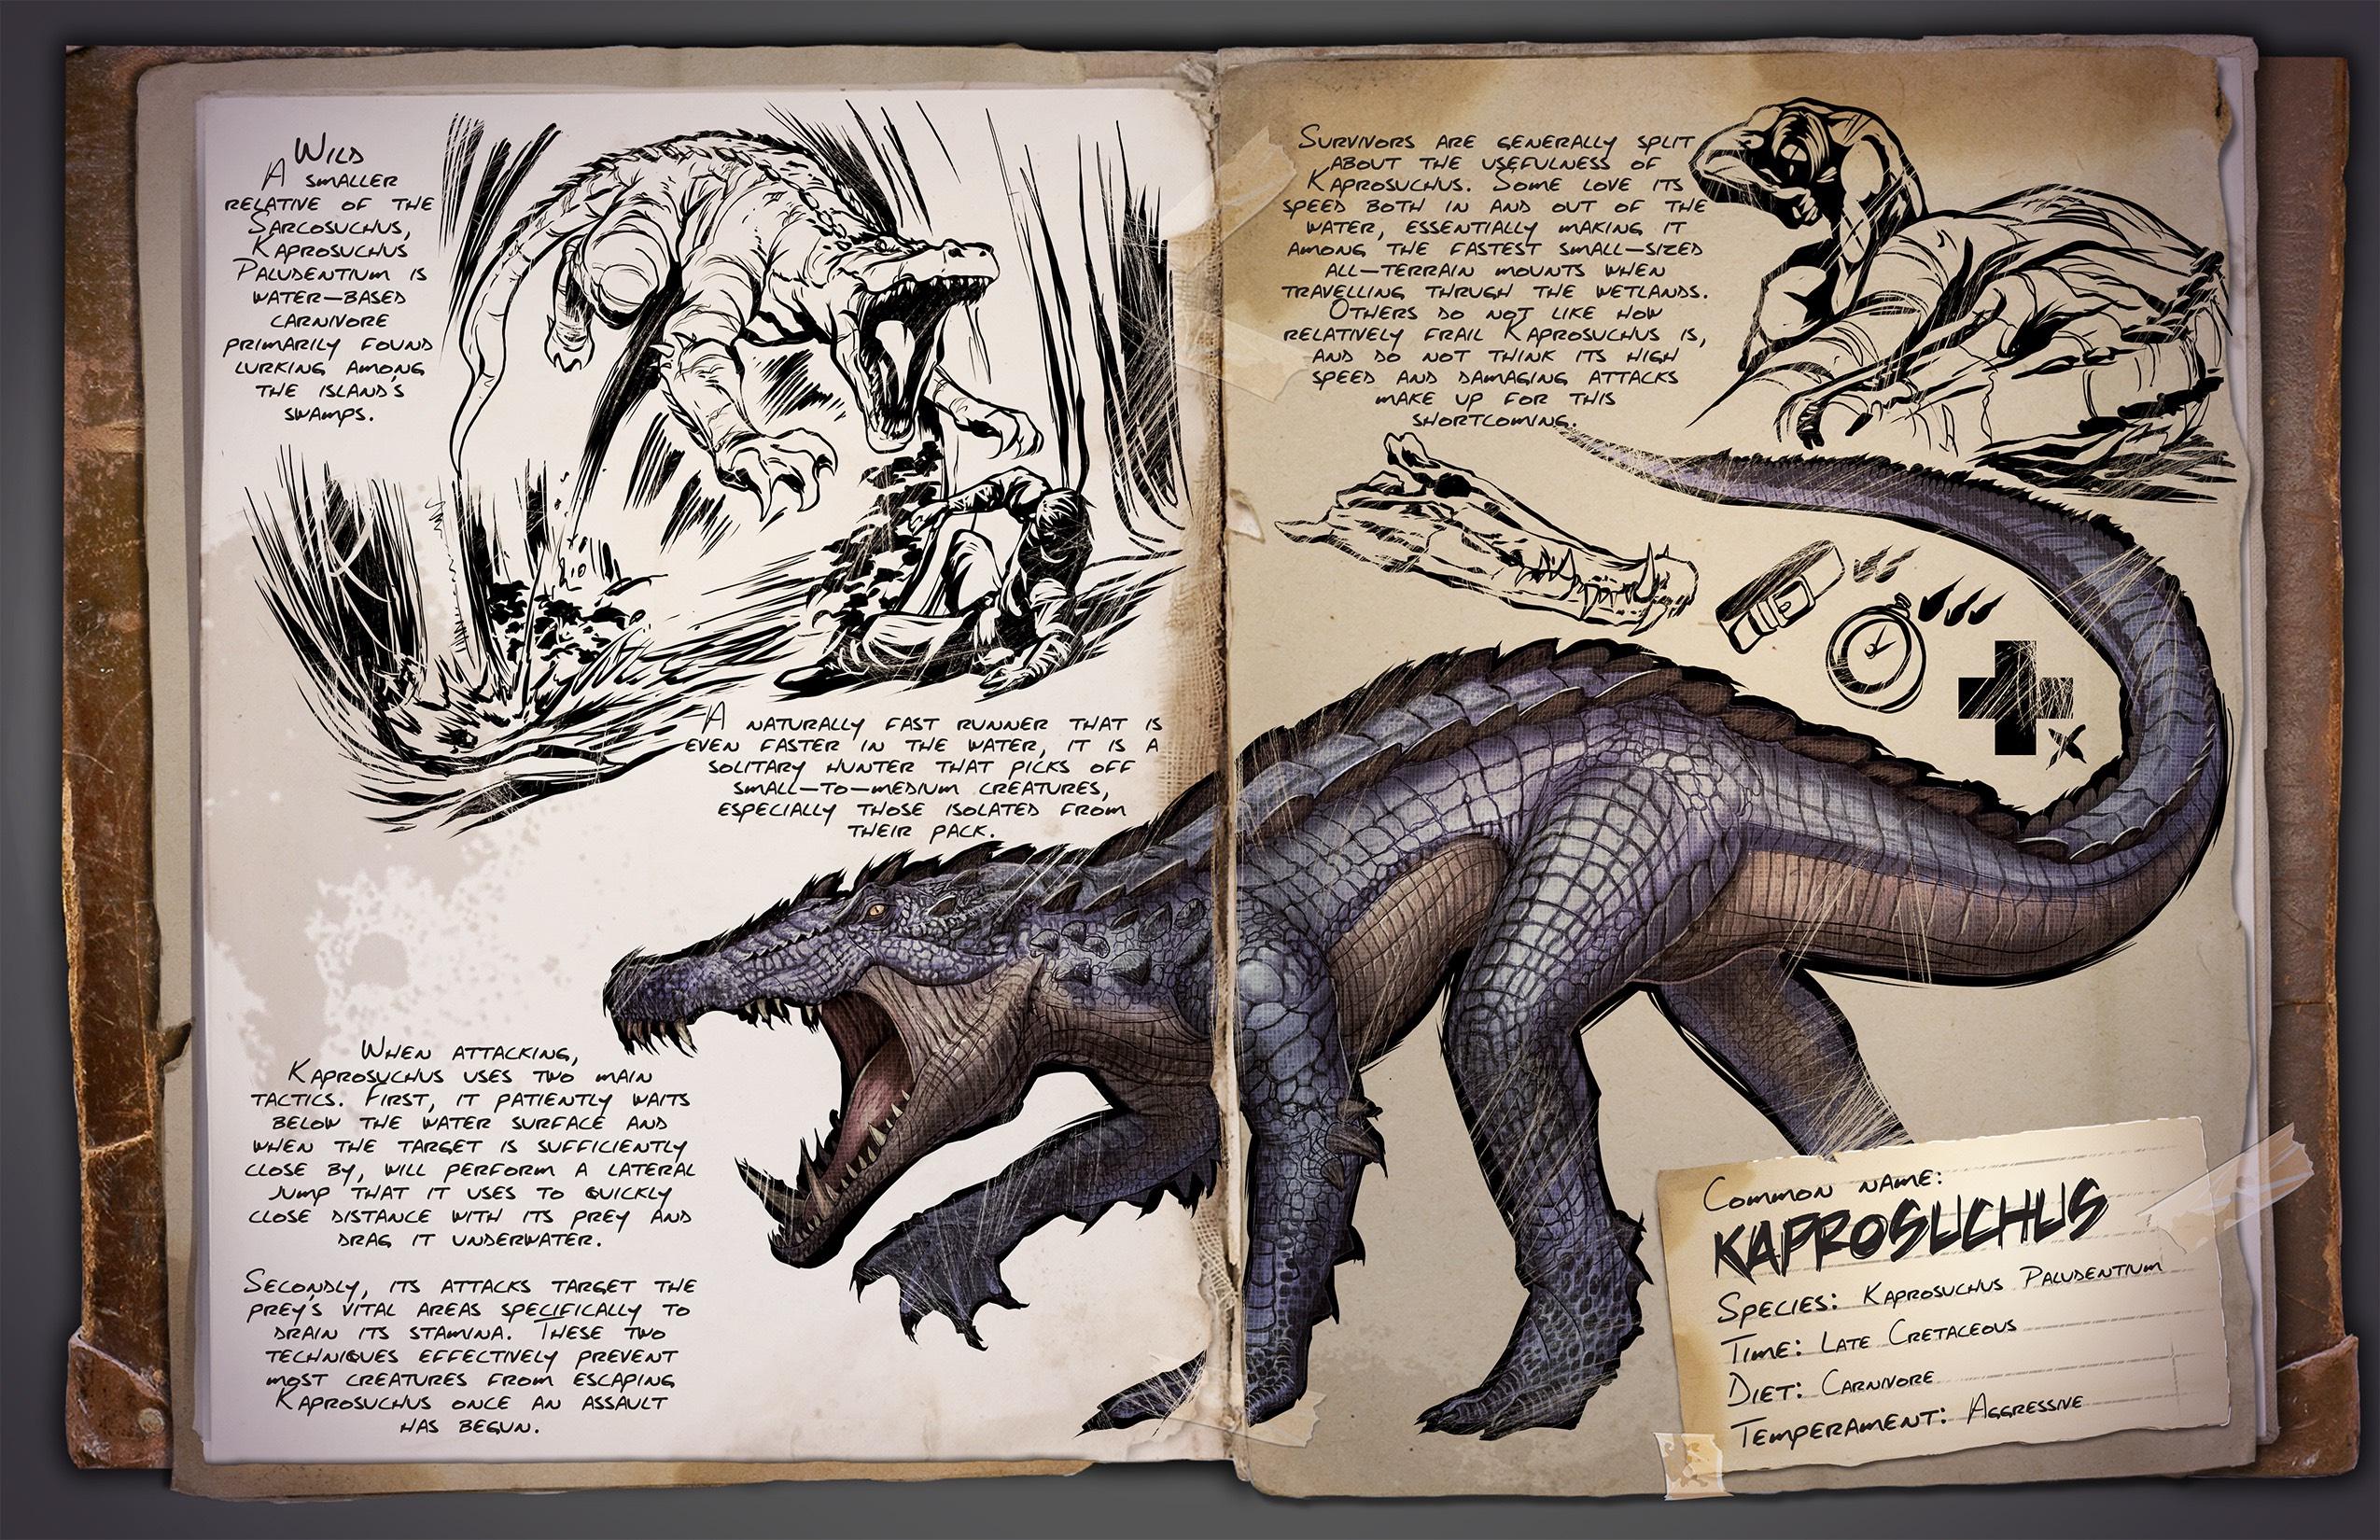 Dino Dossier: Kaprosuchus